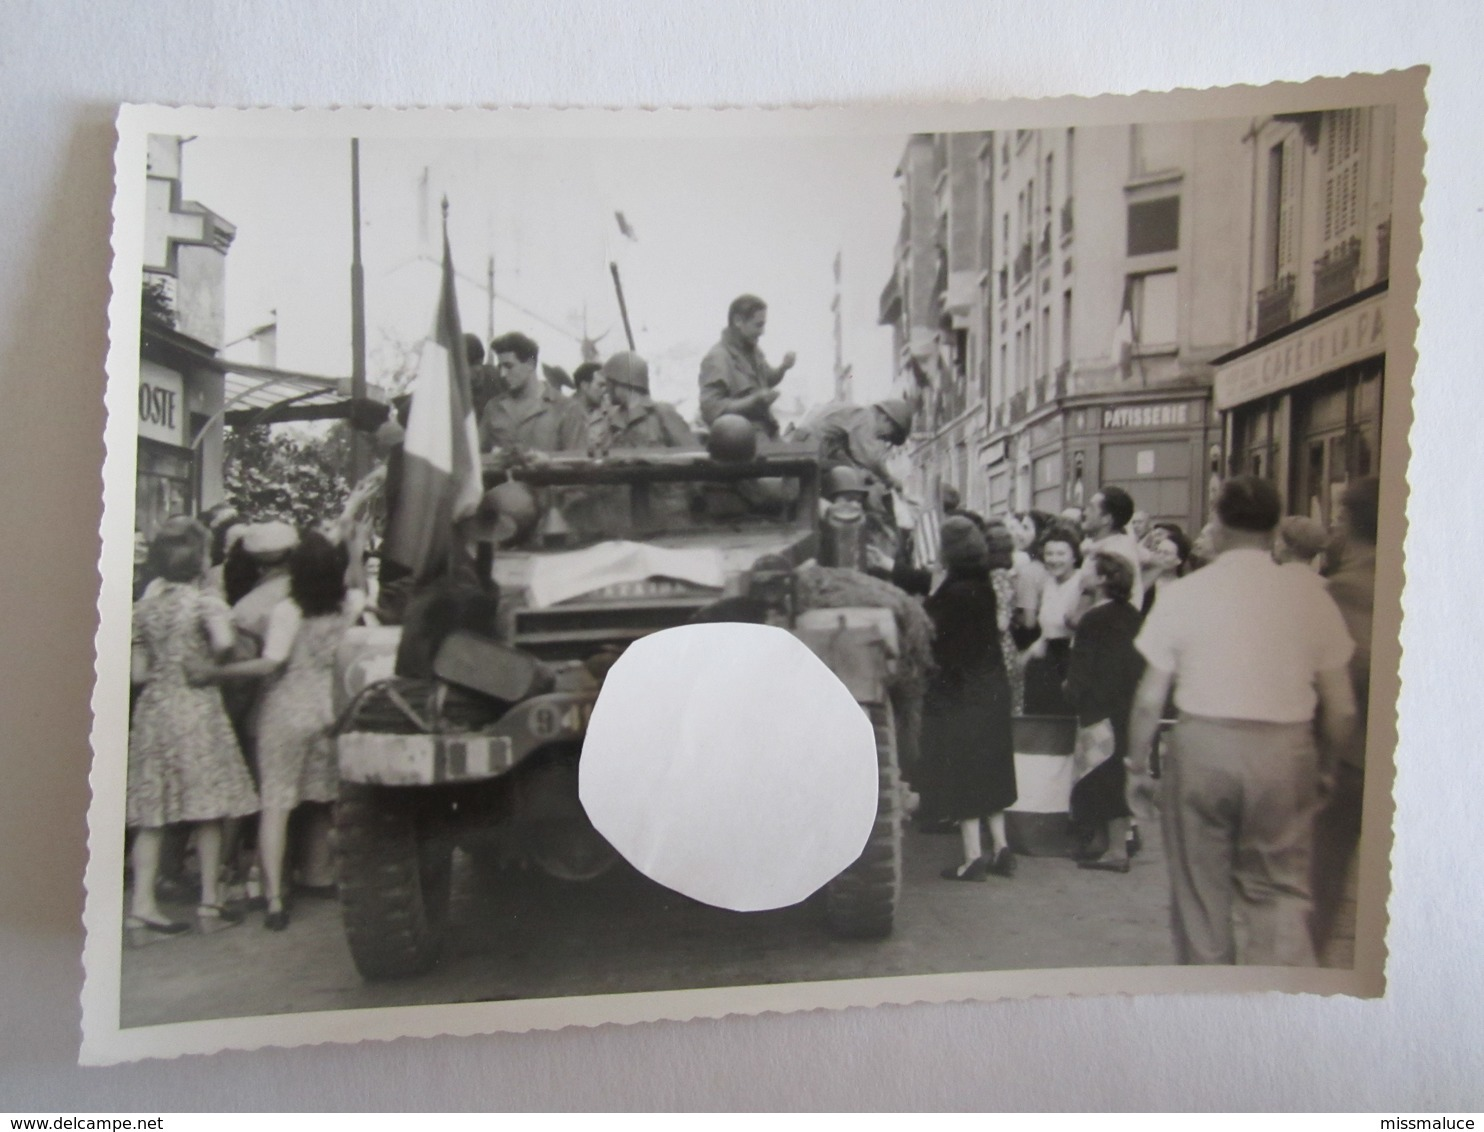 Militaire Militaria Photo Photos Véhicule Américain Libération France 1944 Clamart Chevreuse Villacoublay - Krieg, Militär